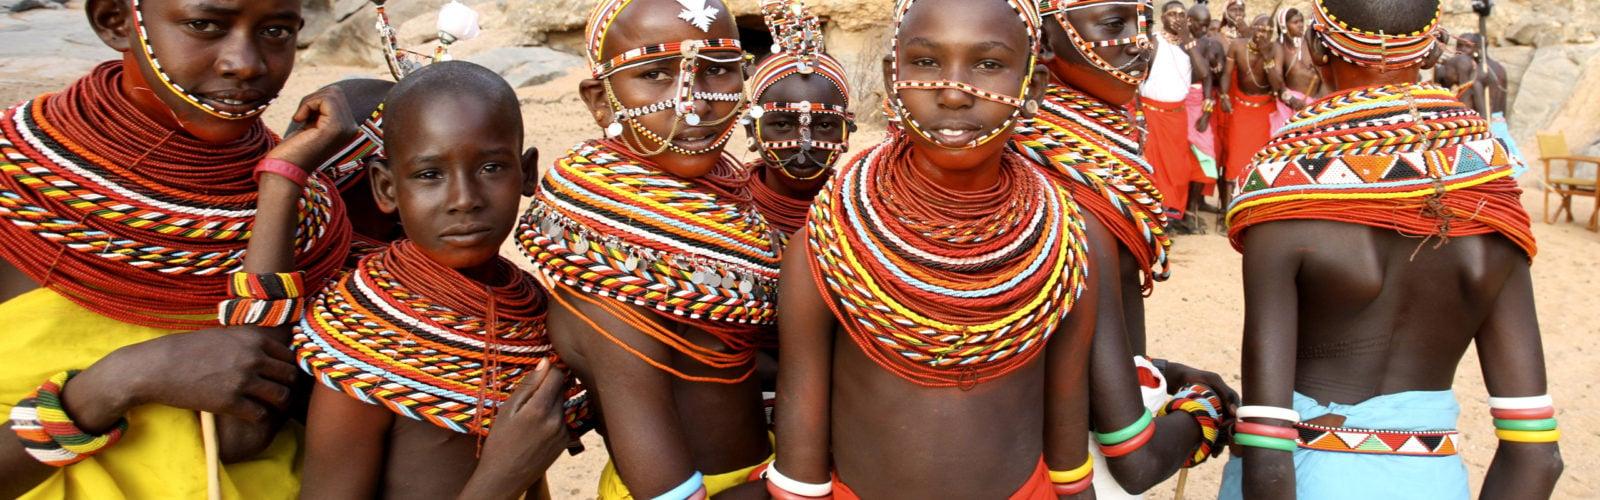 sasaab-samburu-girls